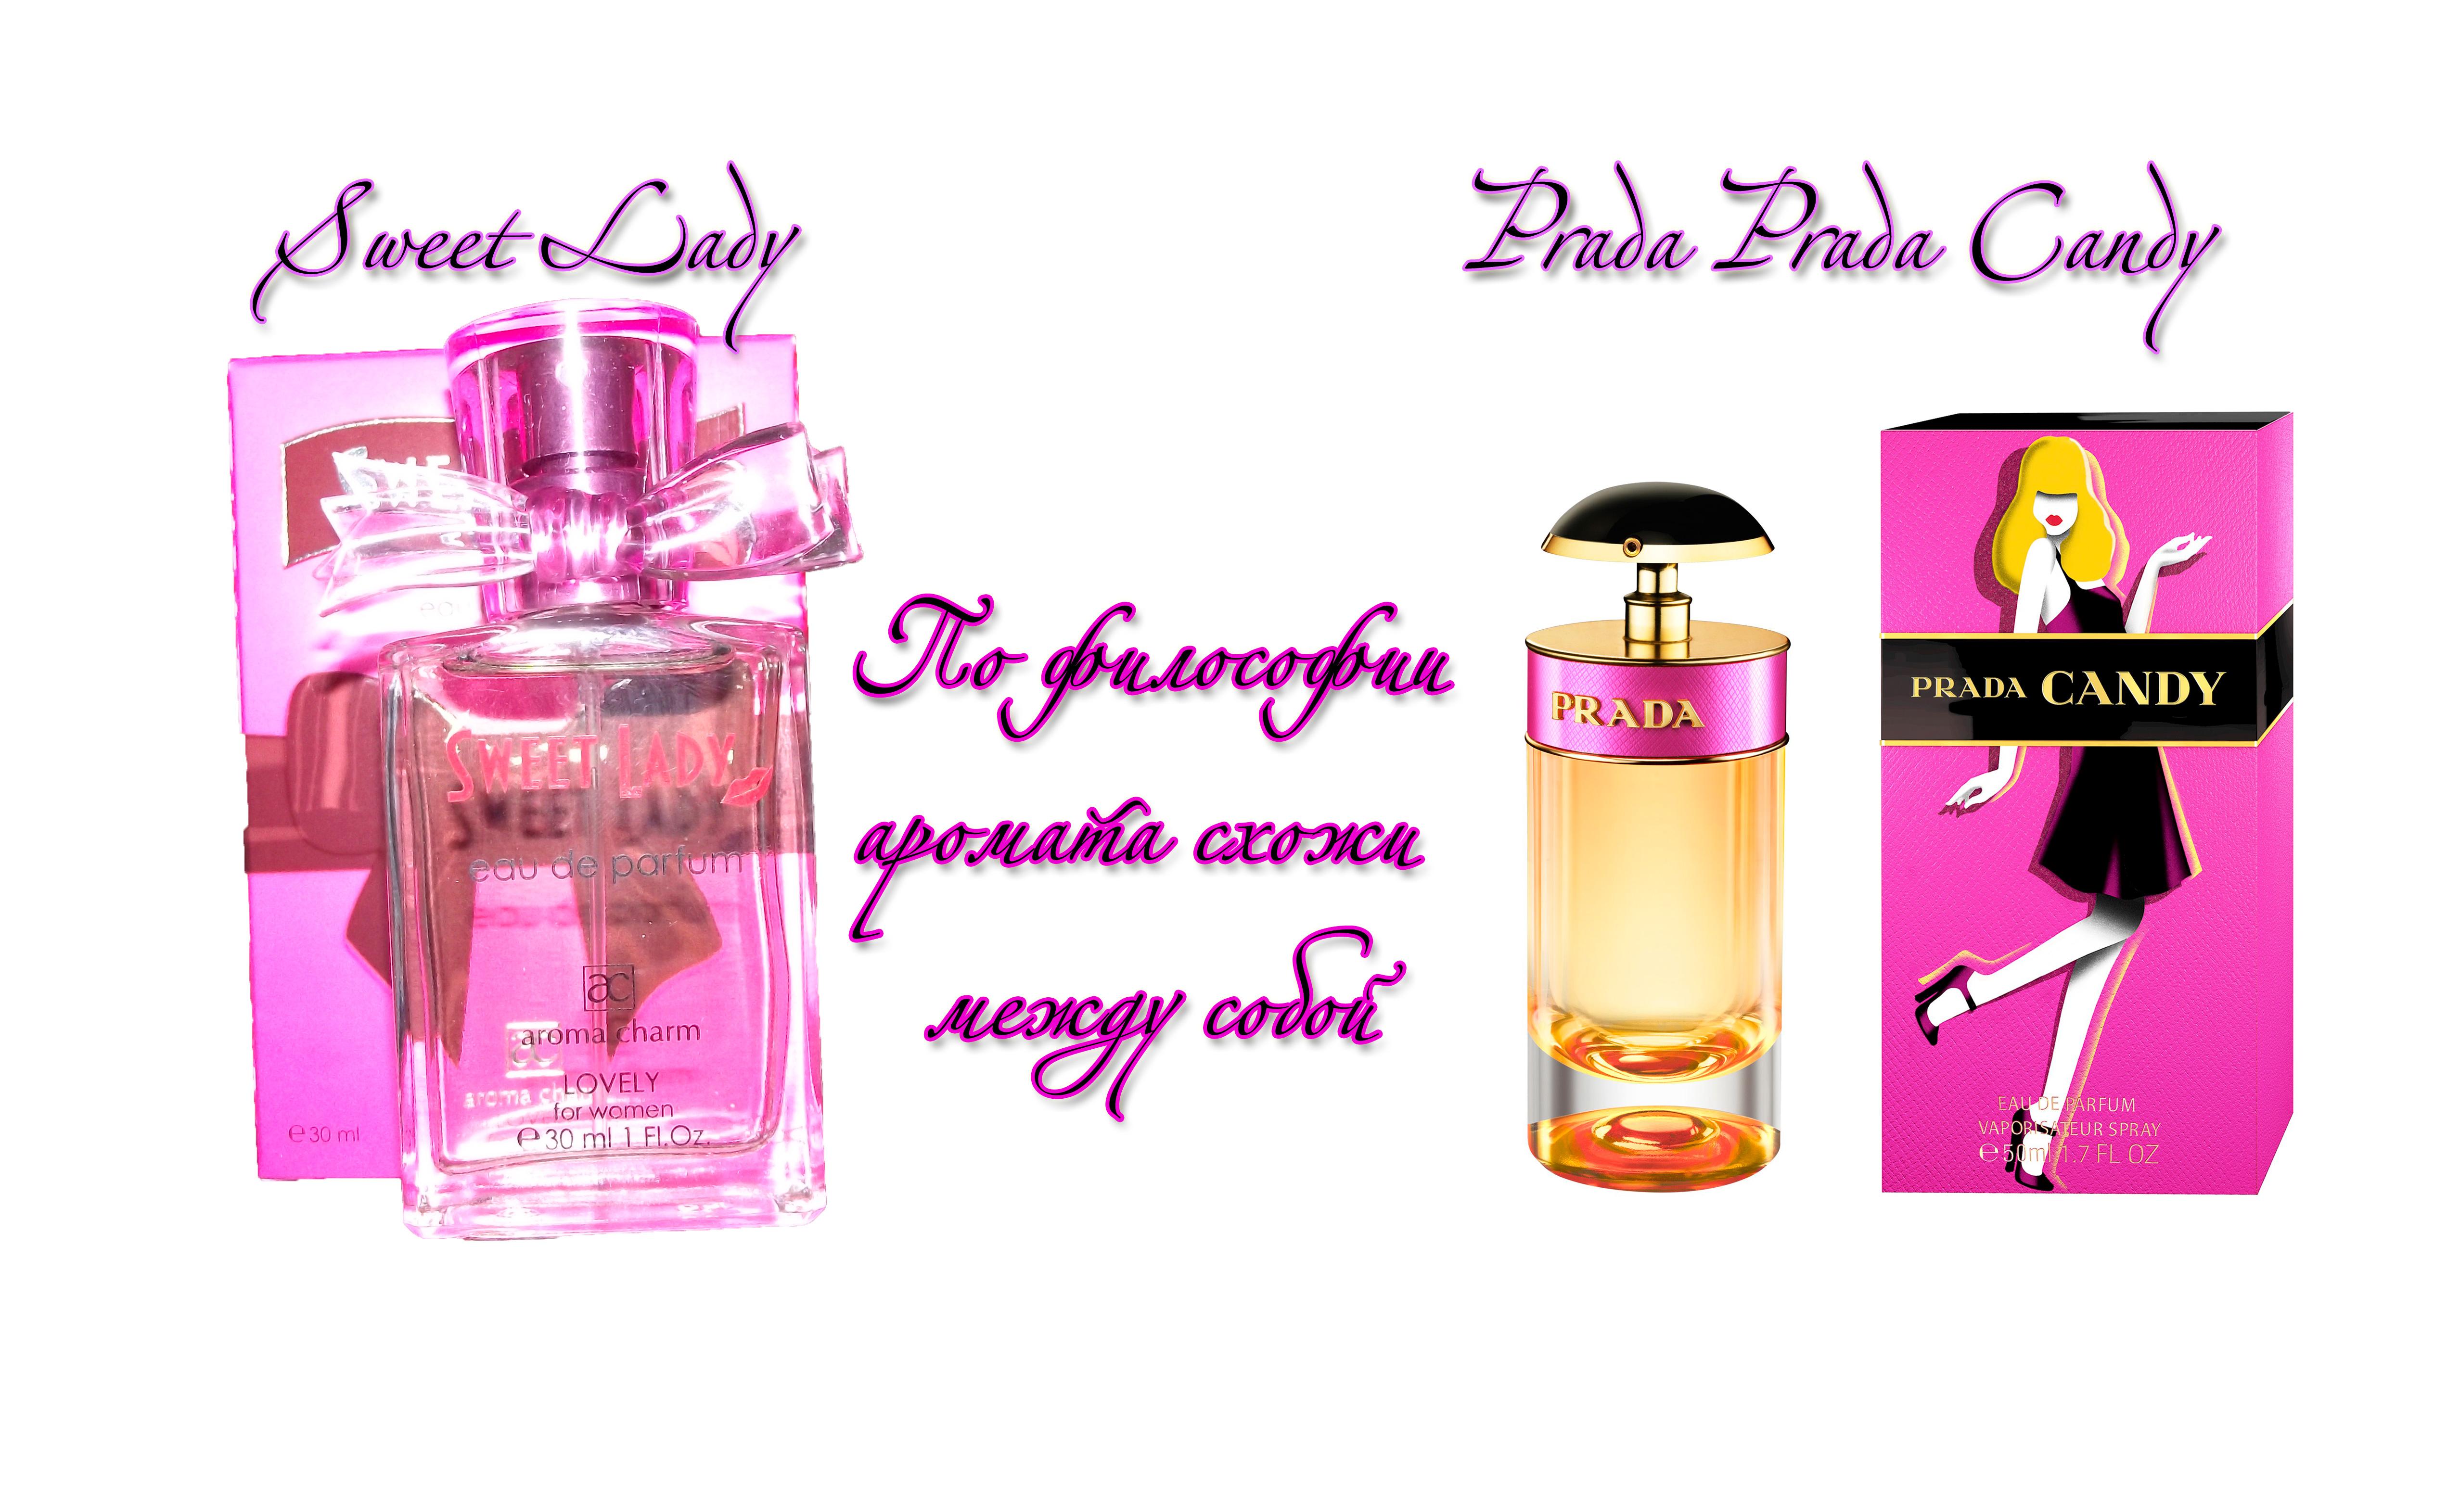 Sweet Lady философия аромата Prada Prada Candy